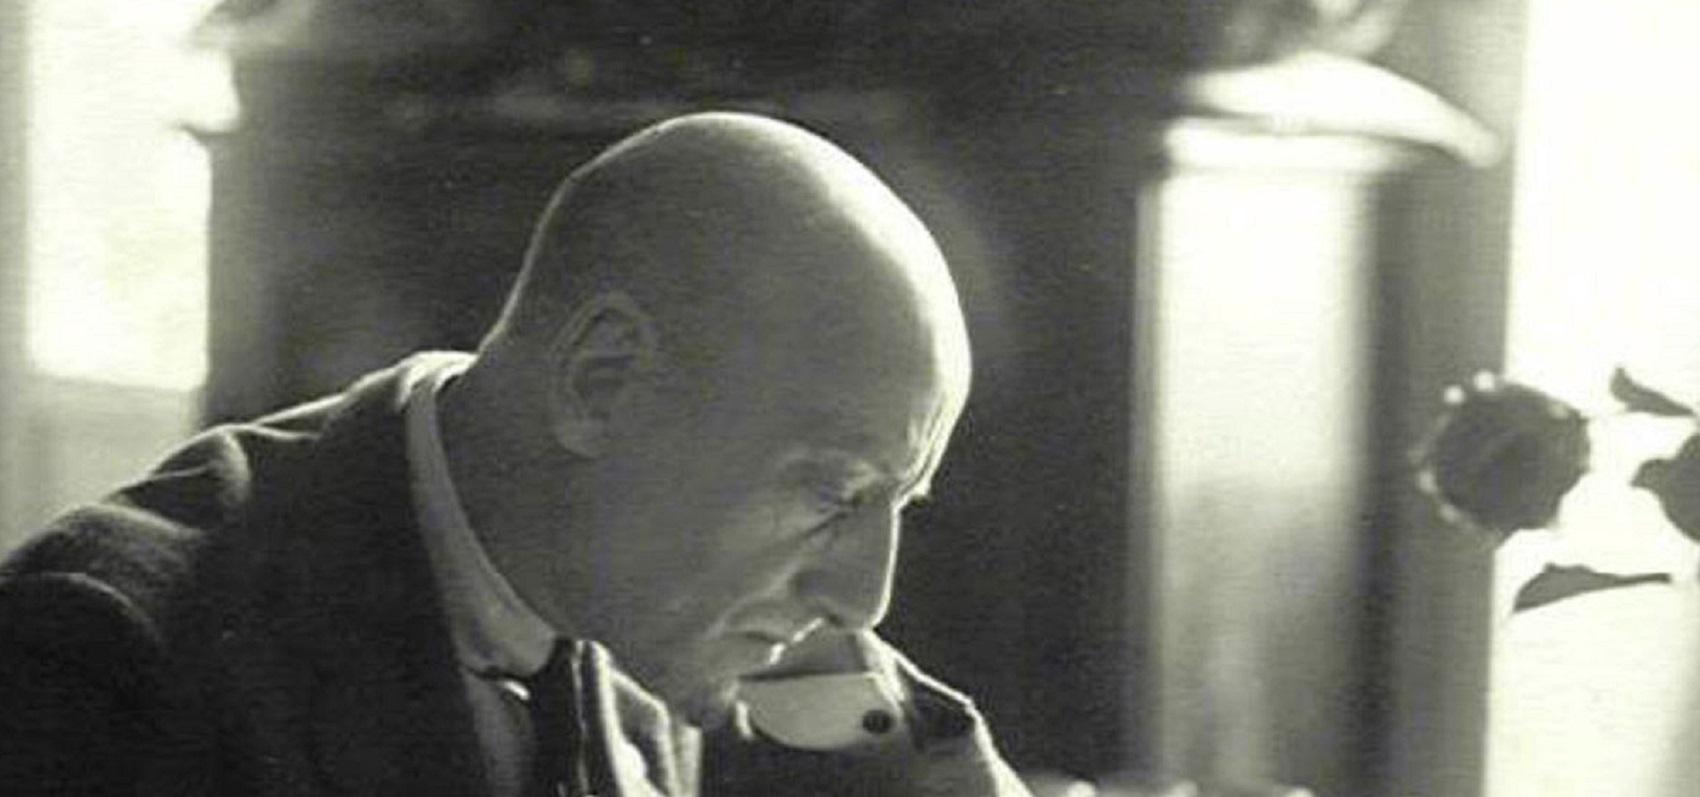 Le métier de la critique: Gabriele D'Annunzio ed il vivere la vita come se fosse un'opera d'arte